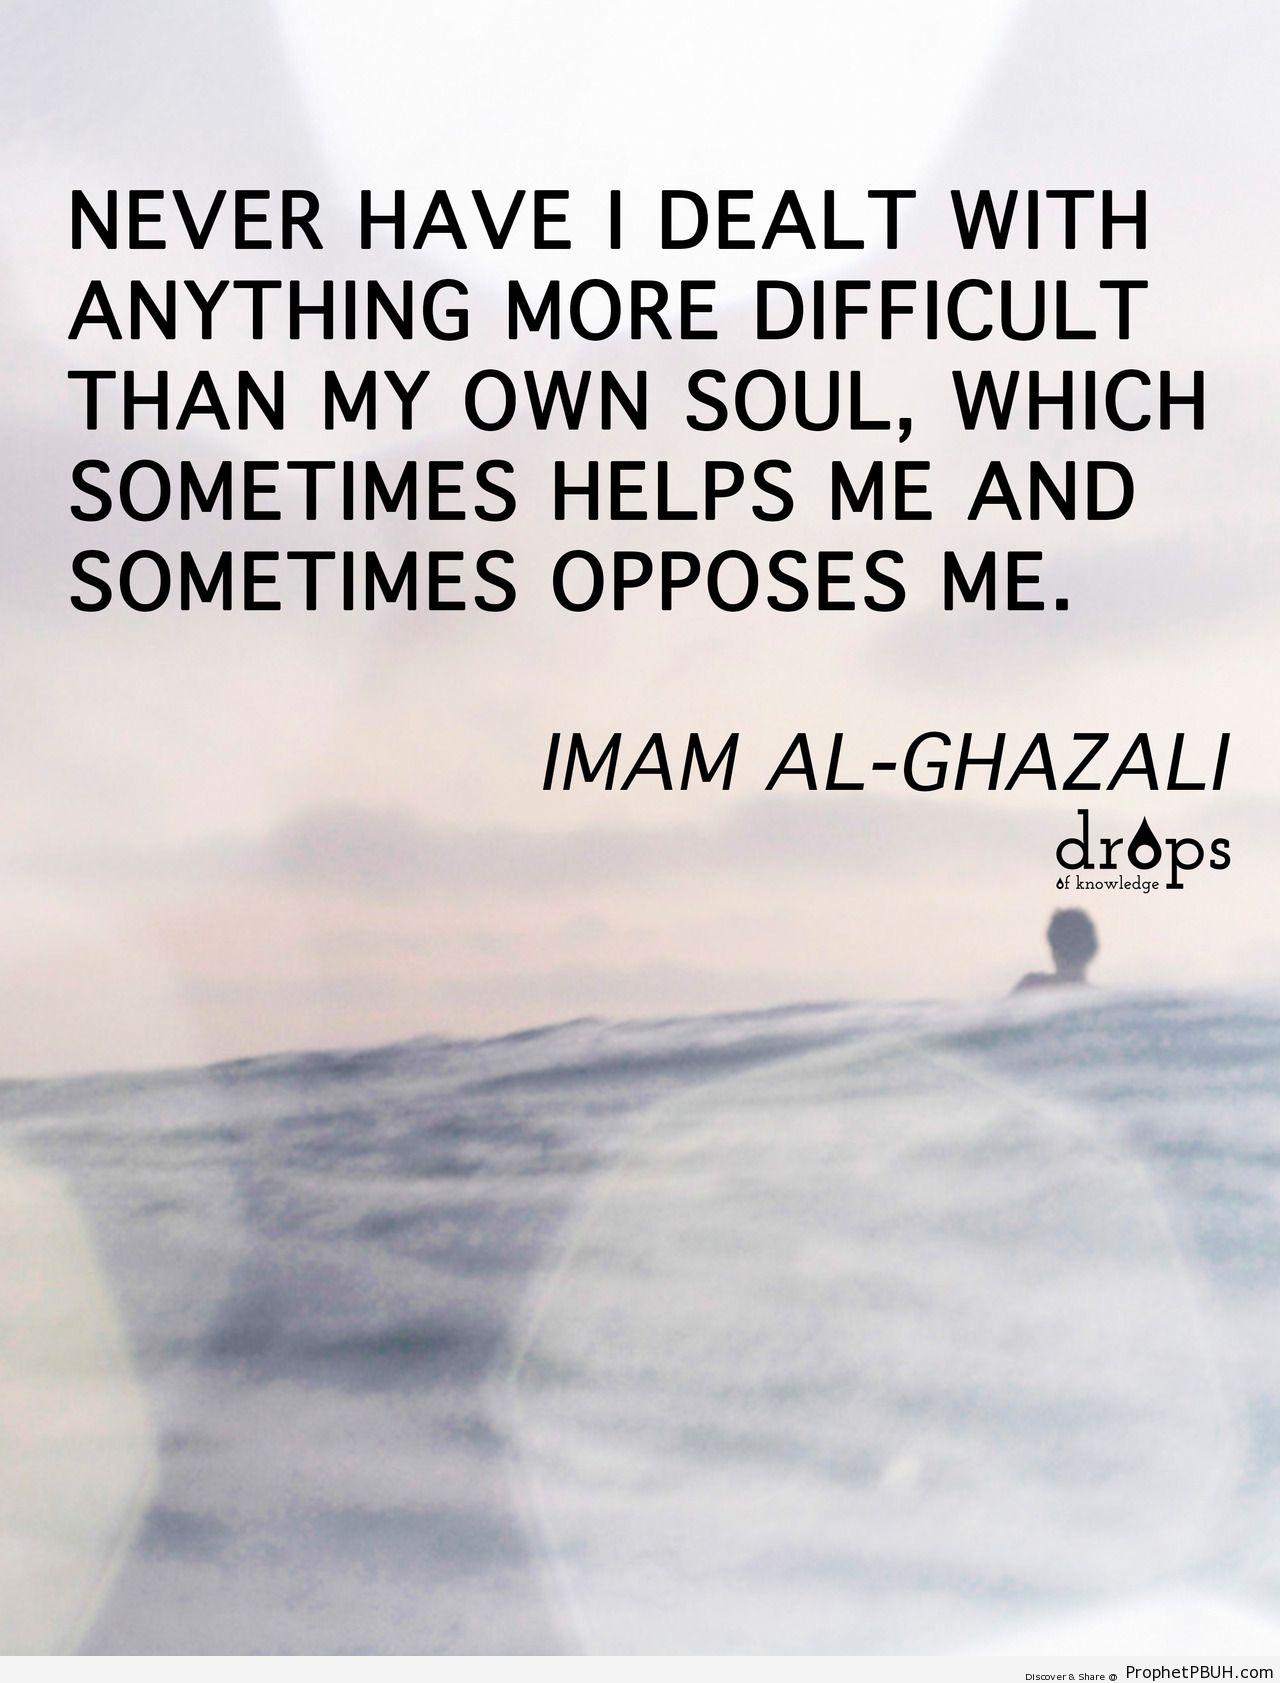 My own soul - Islamic Quotes, Hadiths, Duas